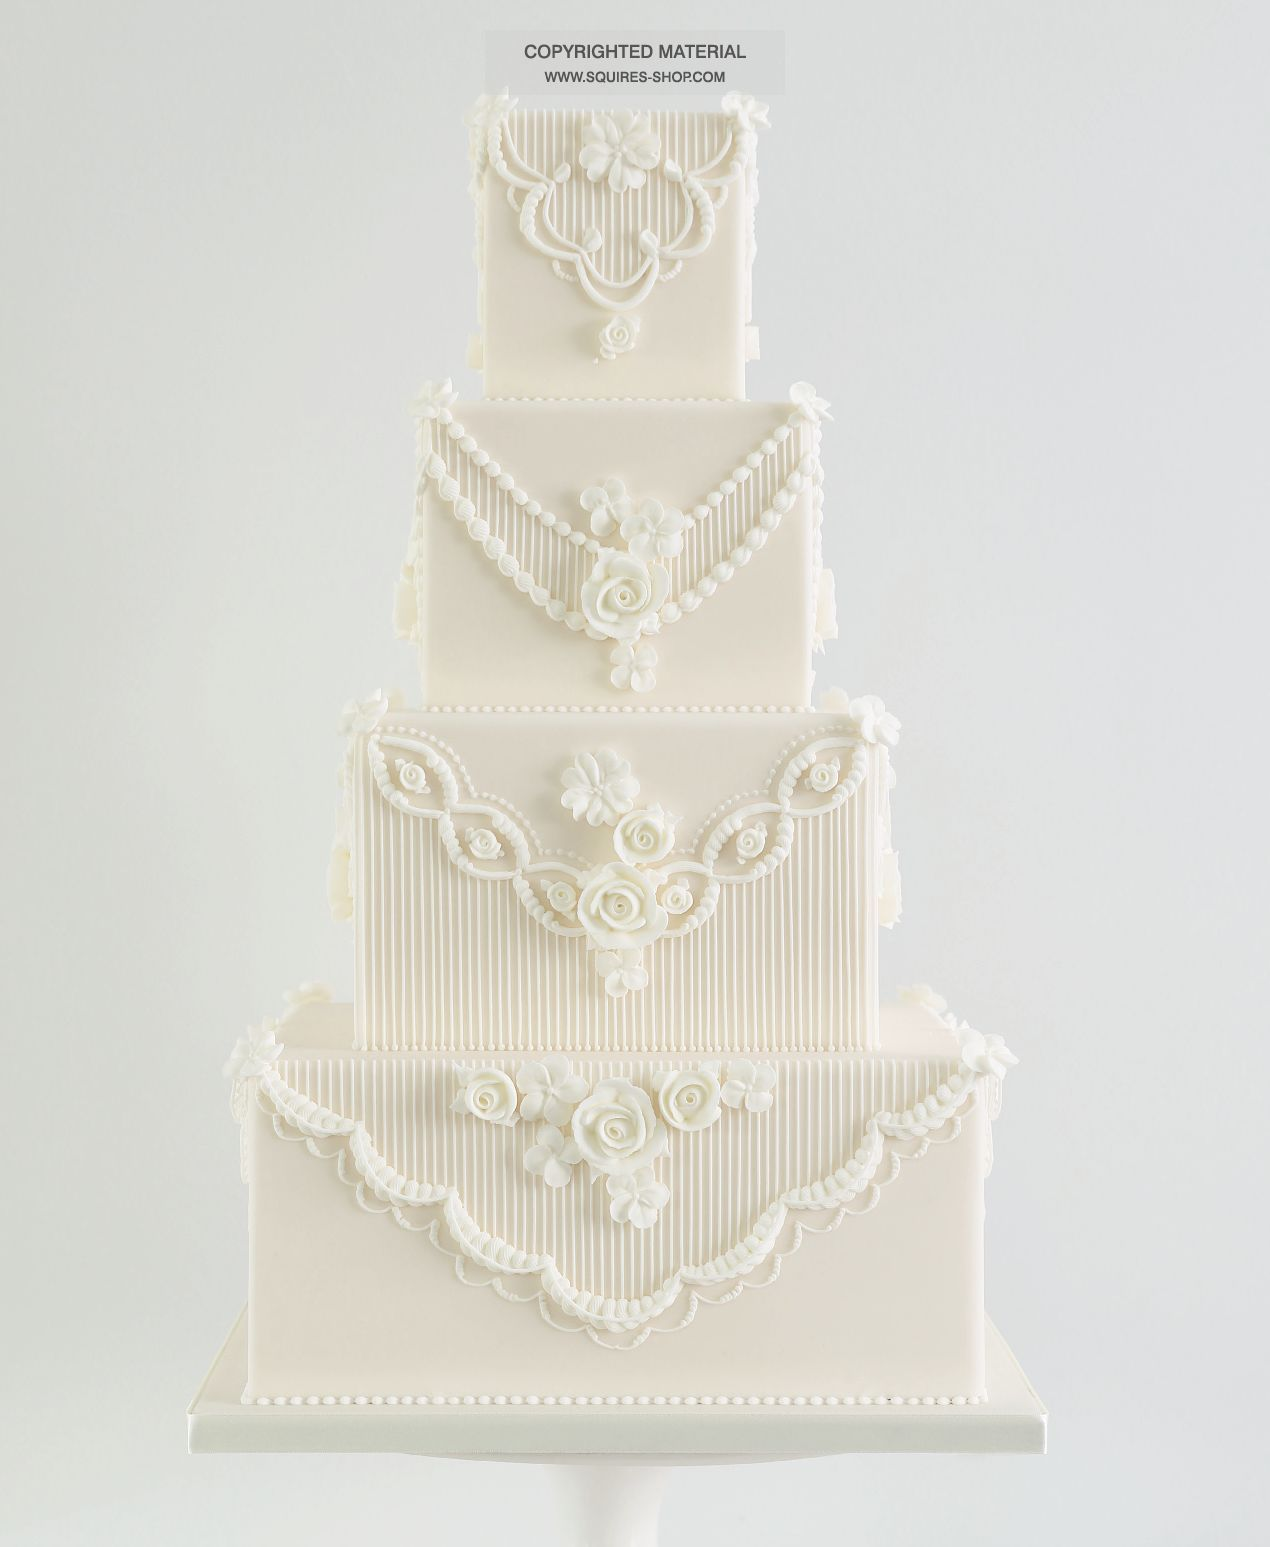 Baking, Cake Decorating 4 Piece Straight Frill Cutter Design Sugarcraft D2